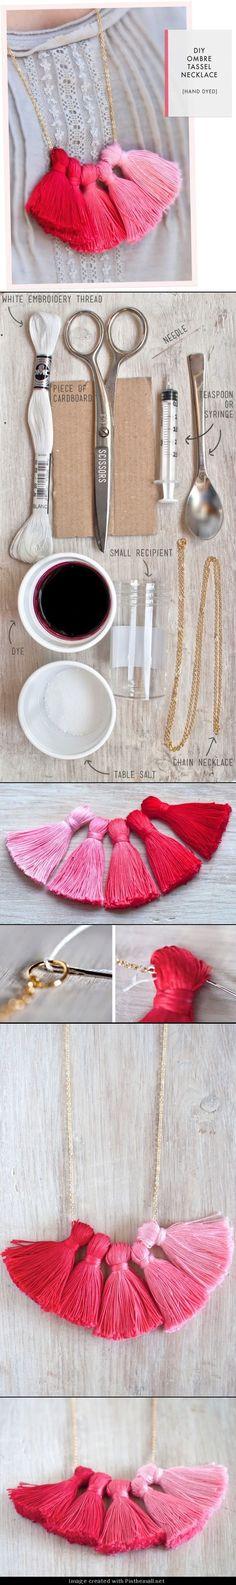 DIY Ombre Tassel Necklace necklace diy diy crafts do it yourself ombre tassel